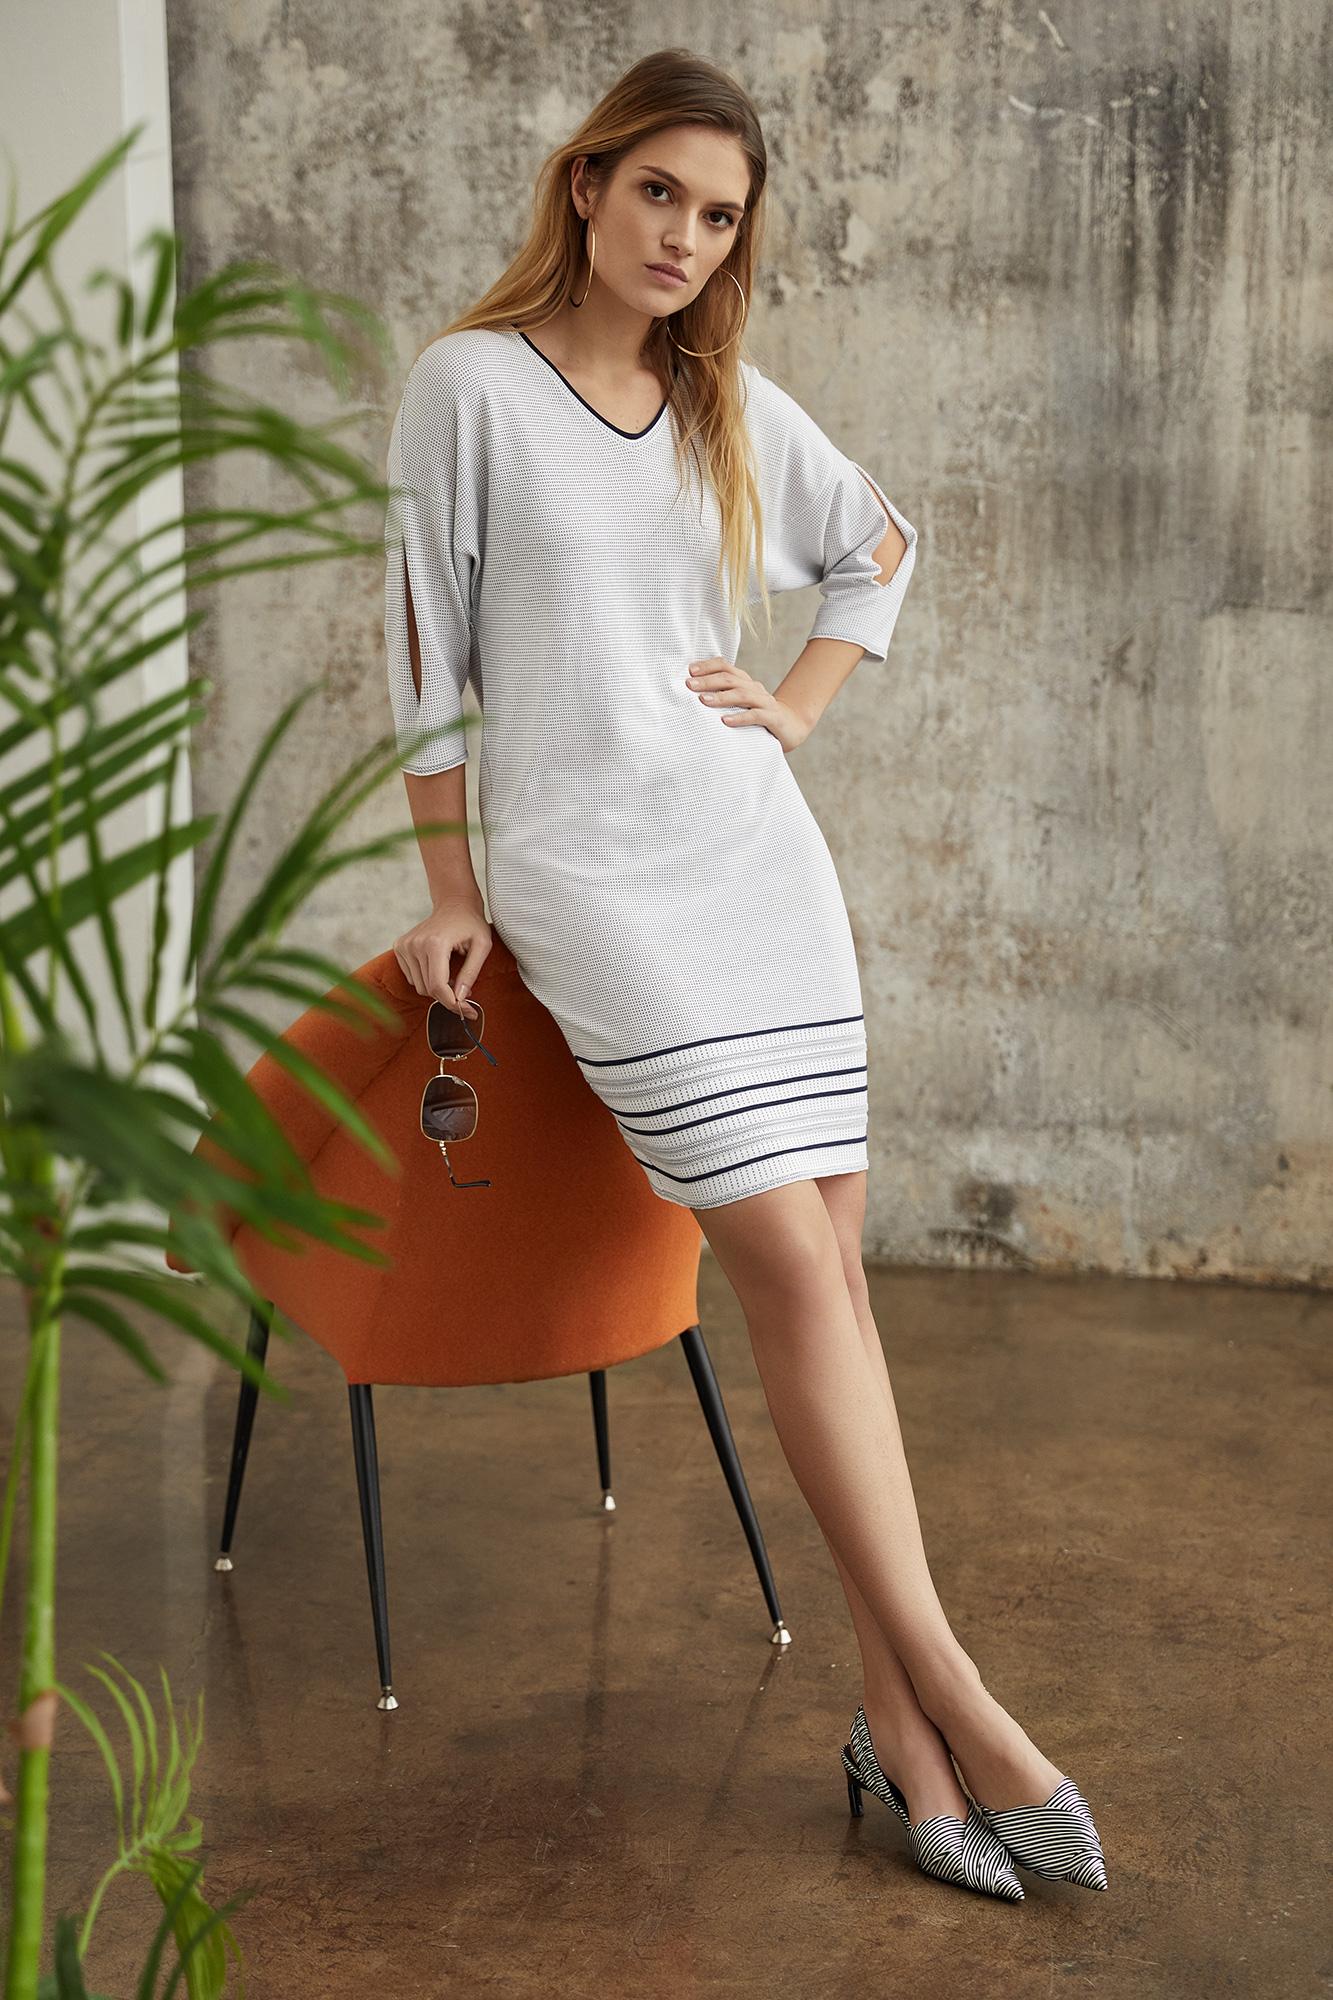 suknia solea, dzianina, biała sukienka